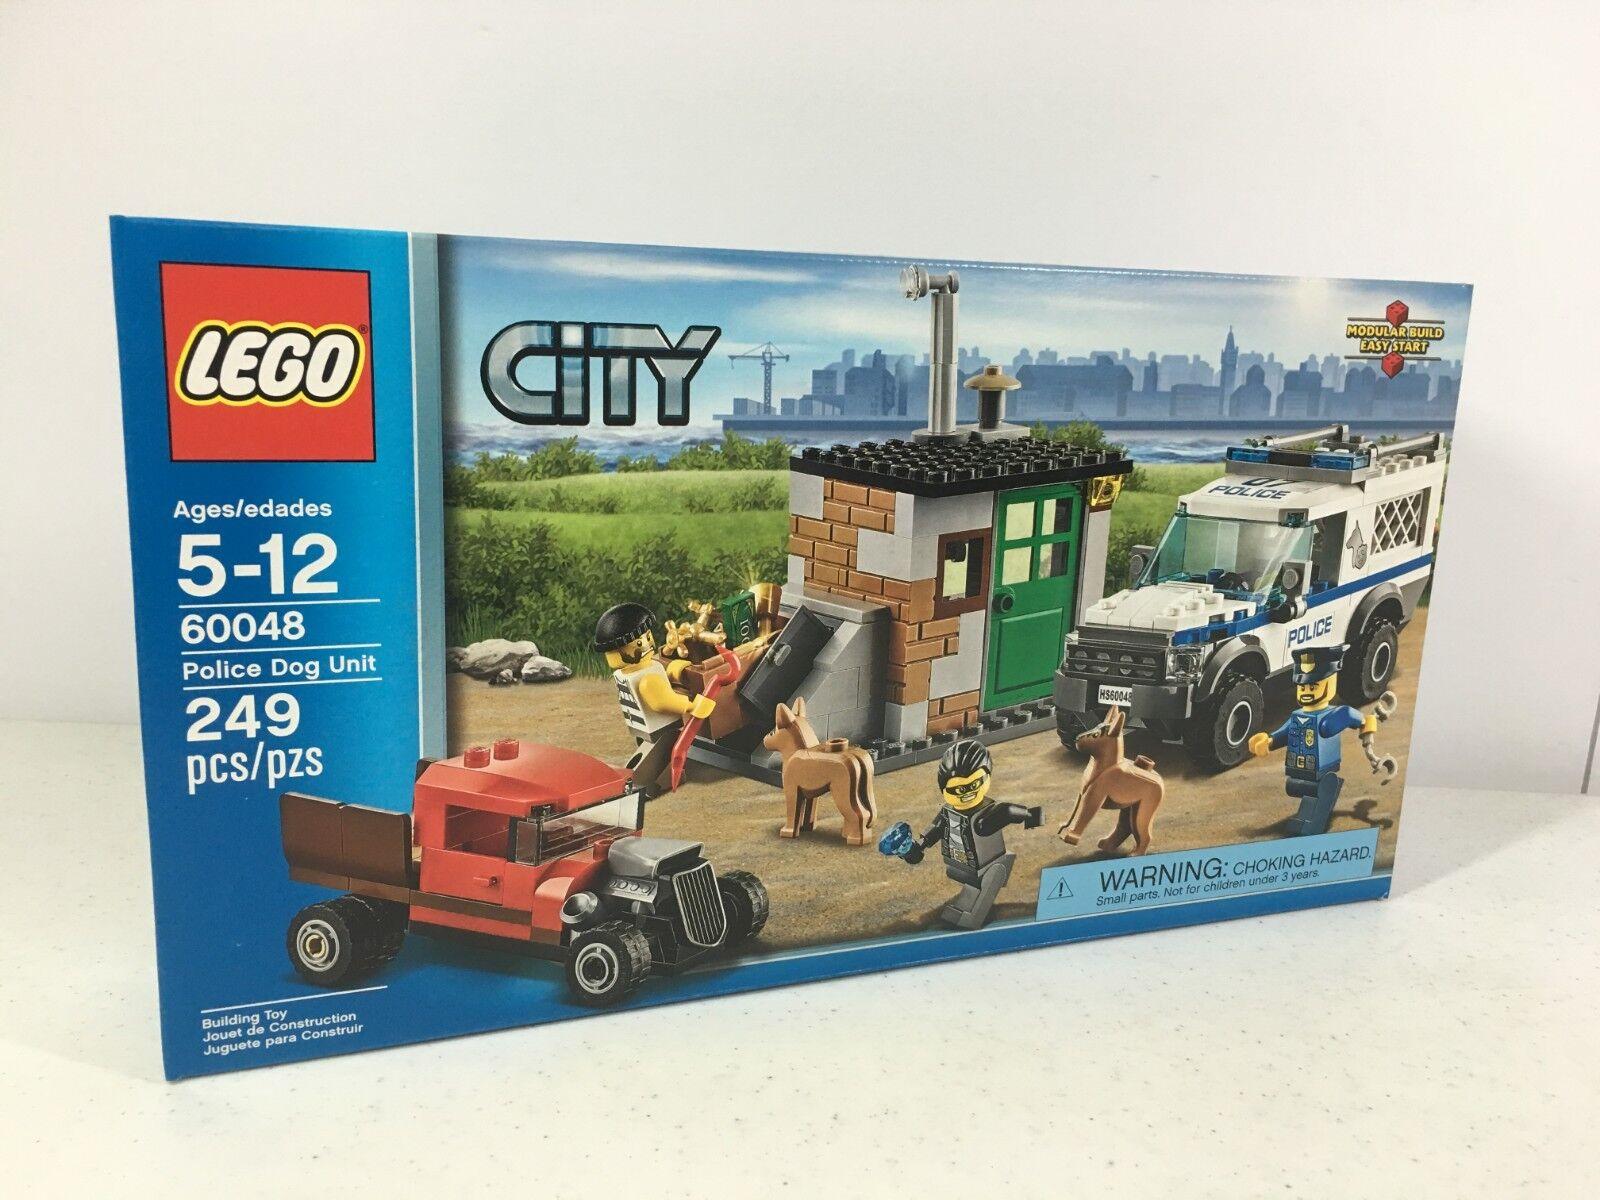 Lego City 60048 Police Dog Unit 249 Pieces RetiROT Set